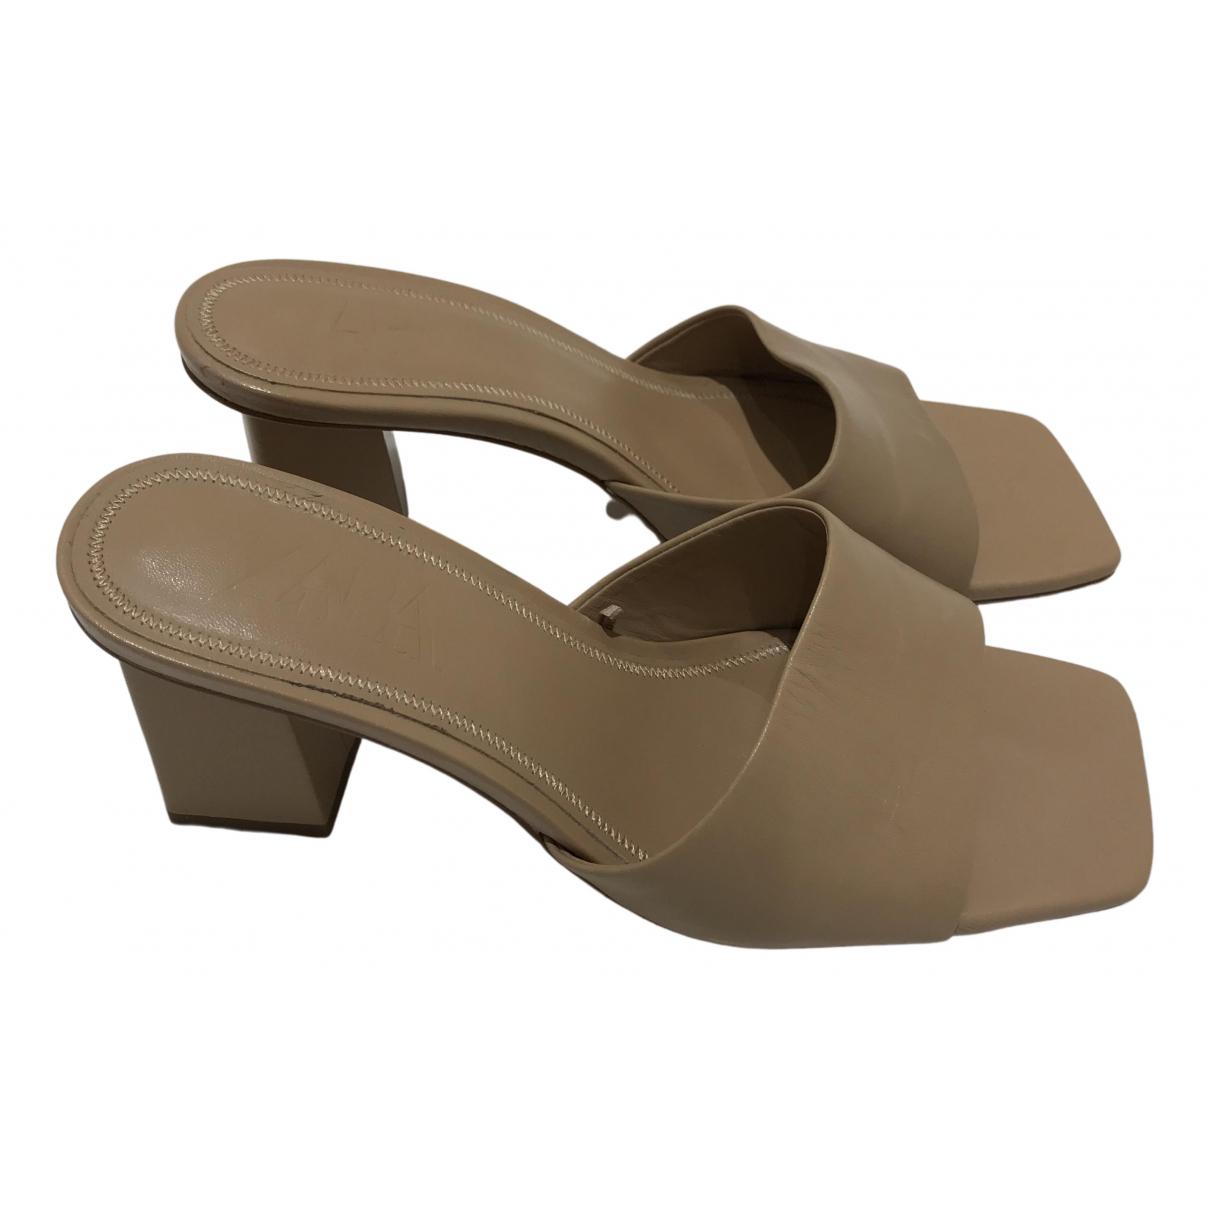 Zara - Sandales   pour femme en cuir - beige